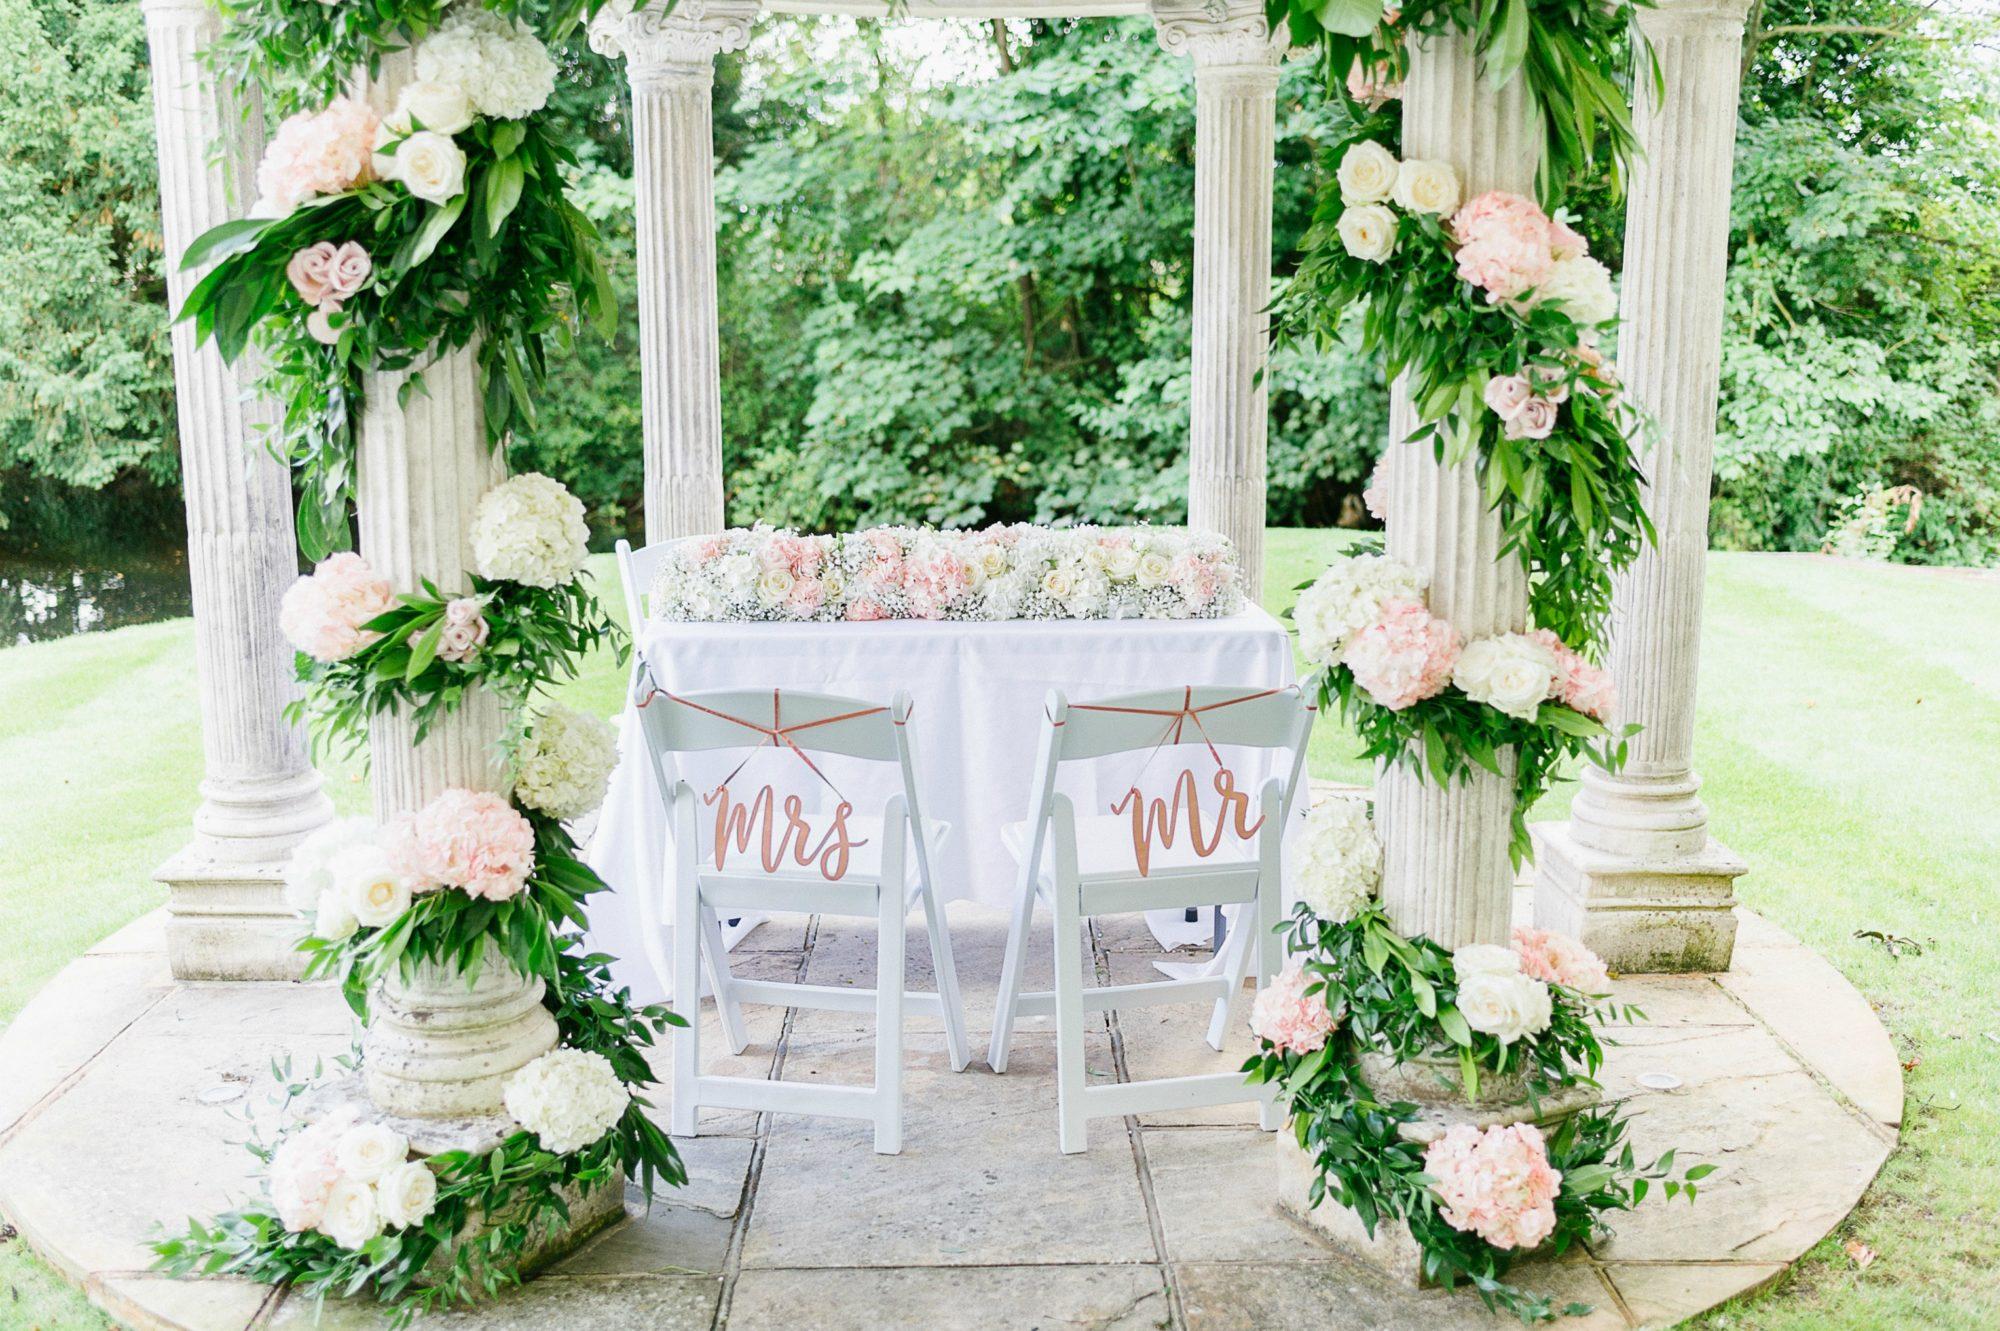 Ardington House Exclusive Use Venue For Events Weddings